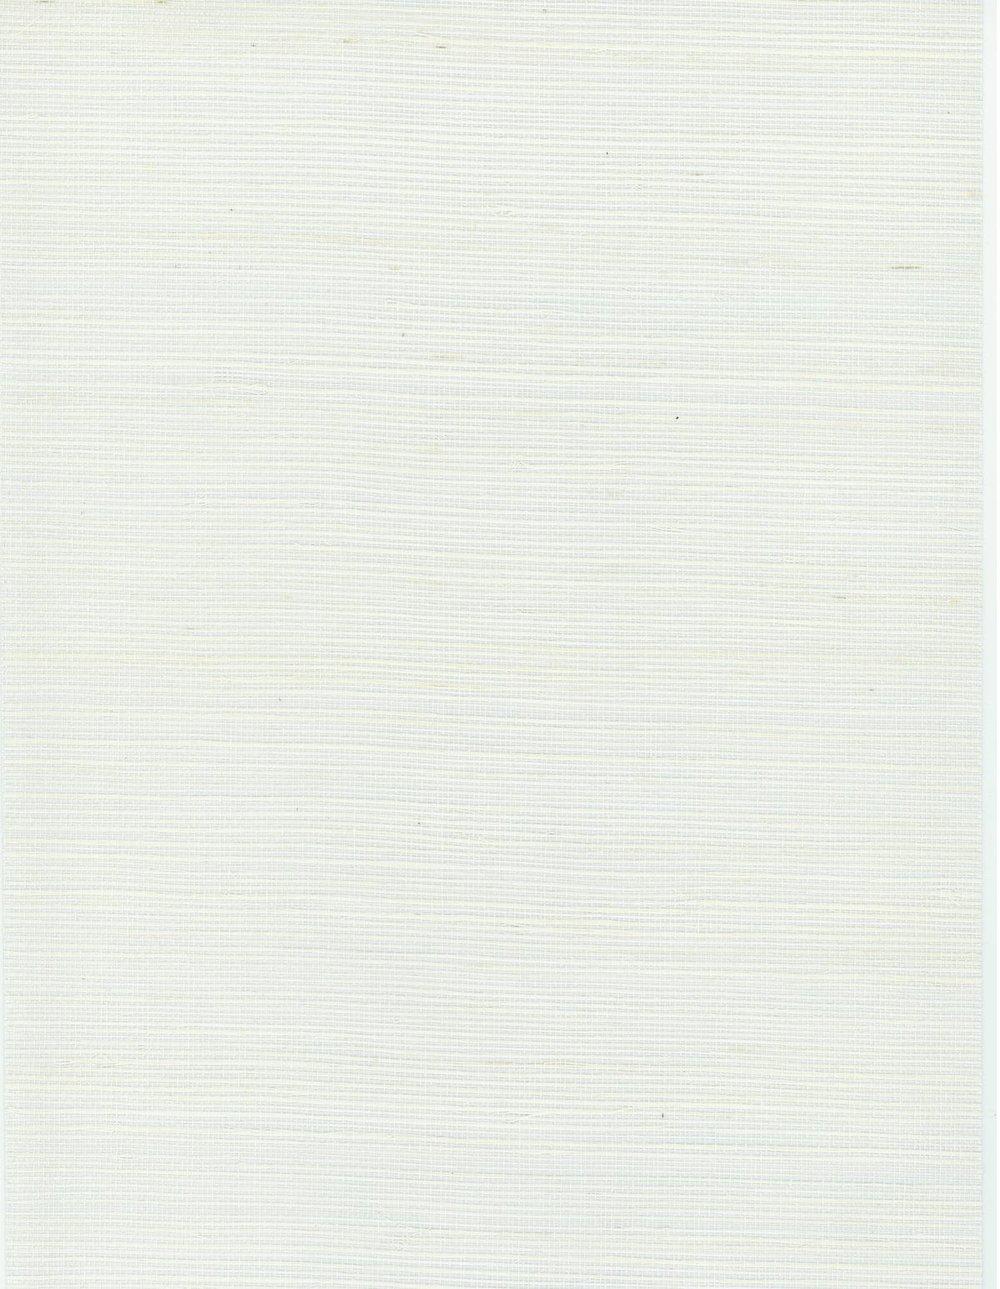 RH5926.jpg